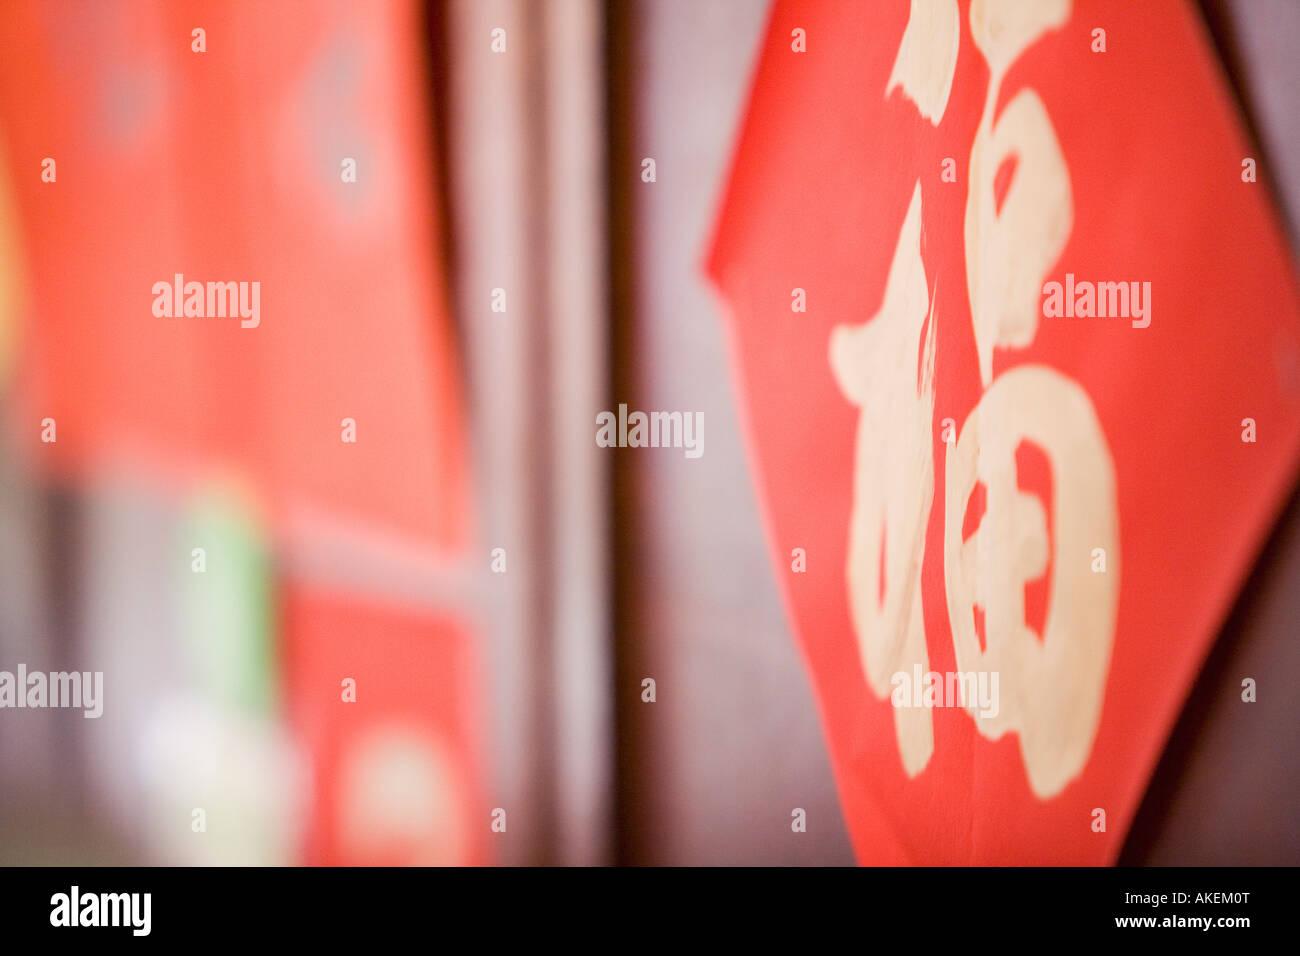 Close-up de un banner de manuscritos script chino Imagen De Stock